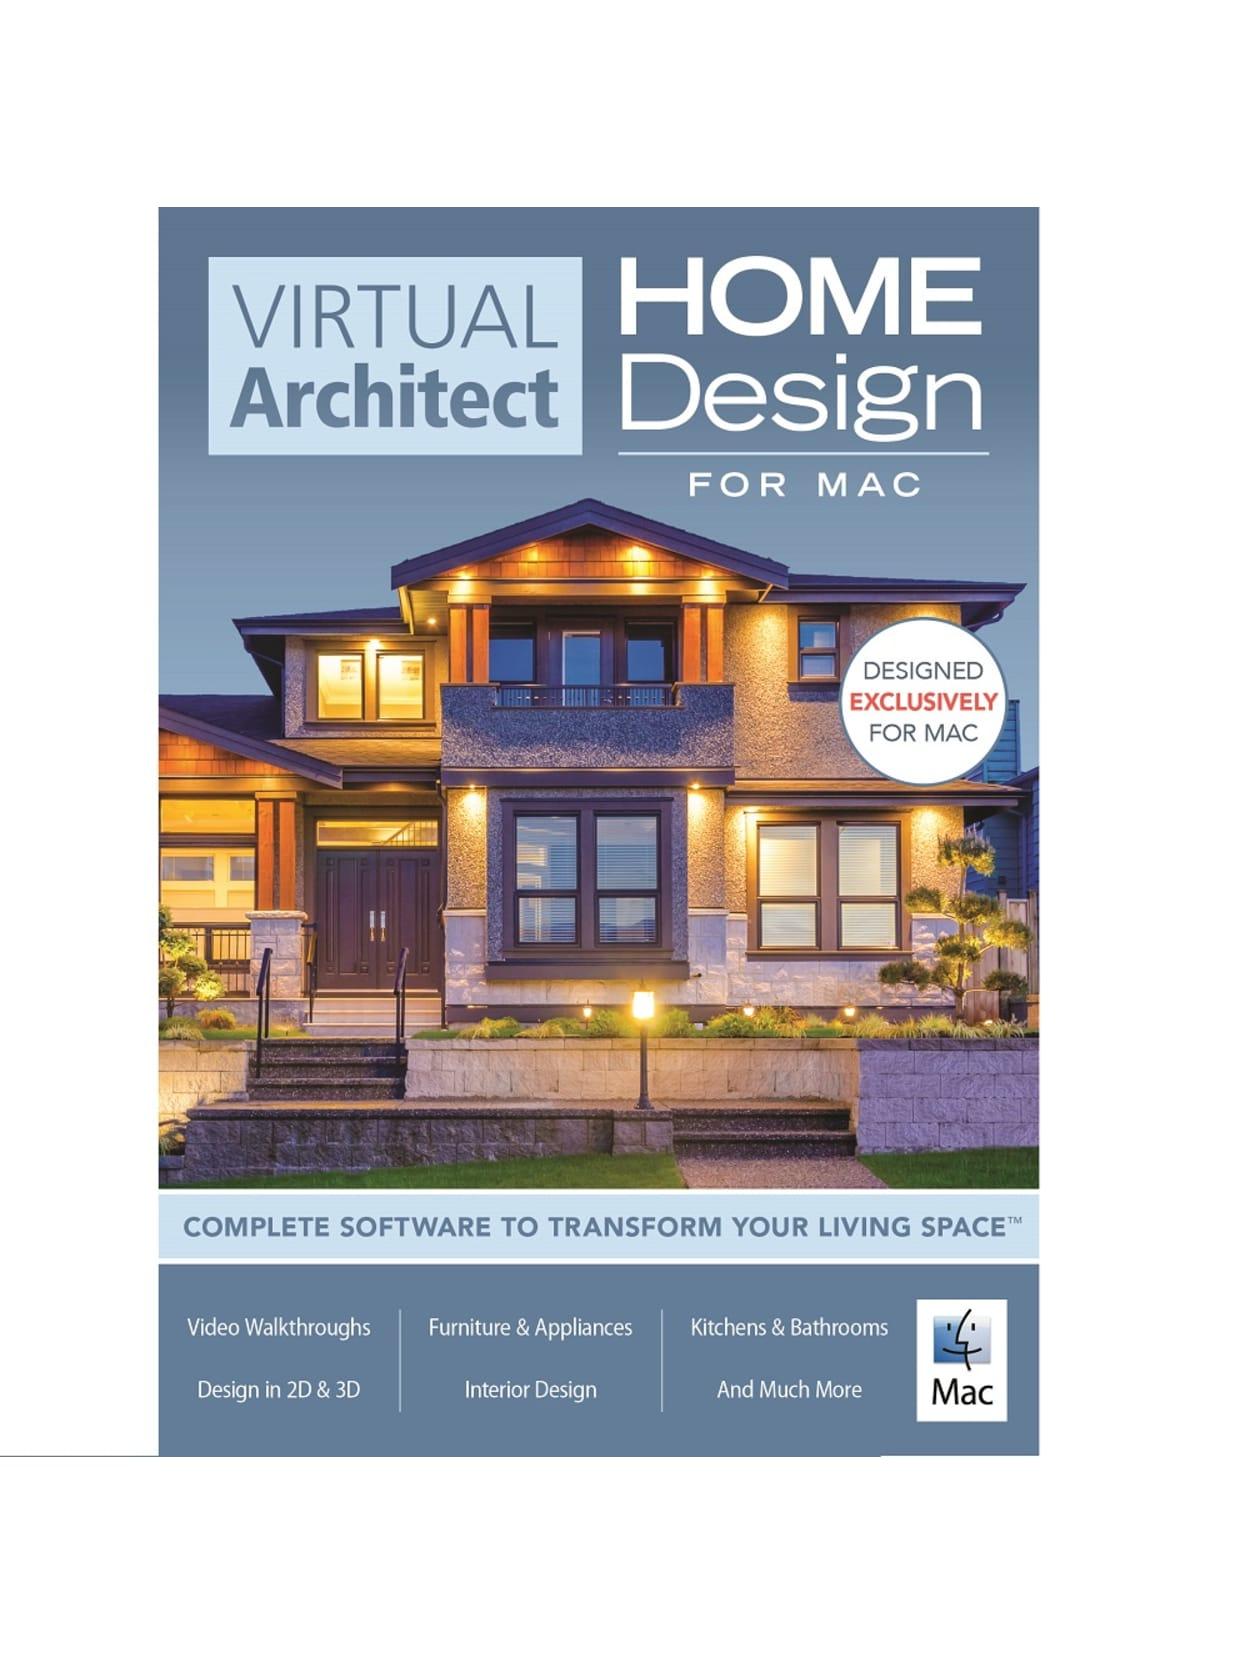 Virtual Architect Home Design Software, For Mac® Item  12